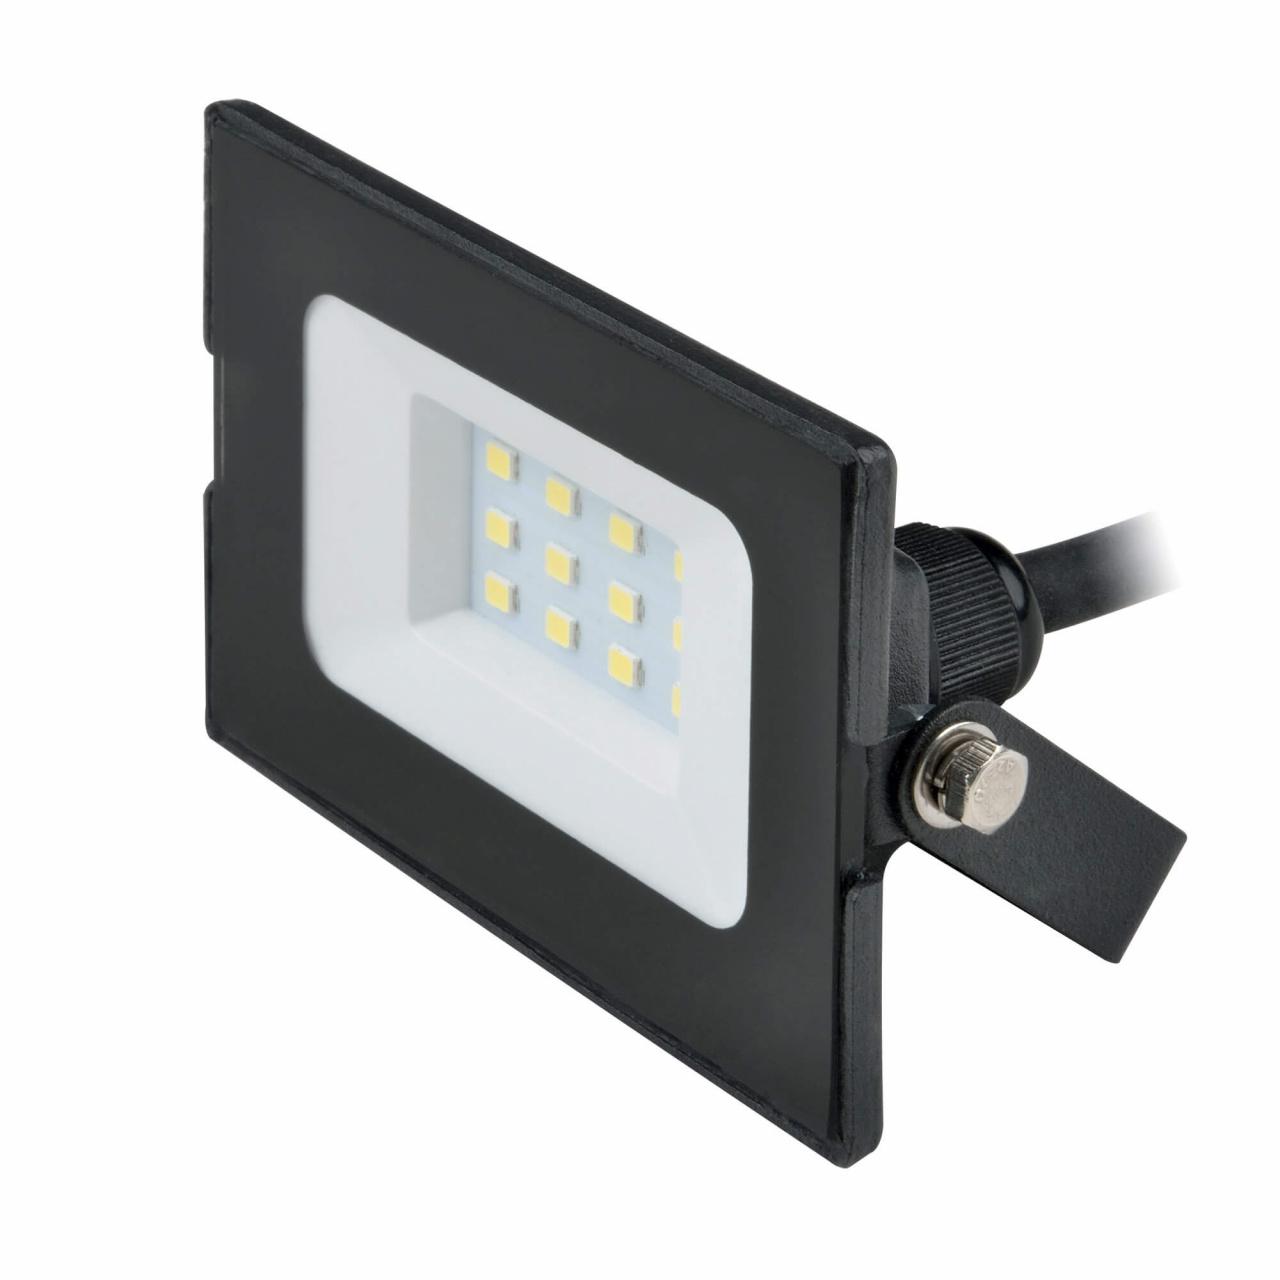 Прожектор Volpe ULF-Q513 10W/RED IP65 220-240В BLACK